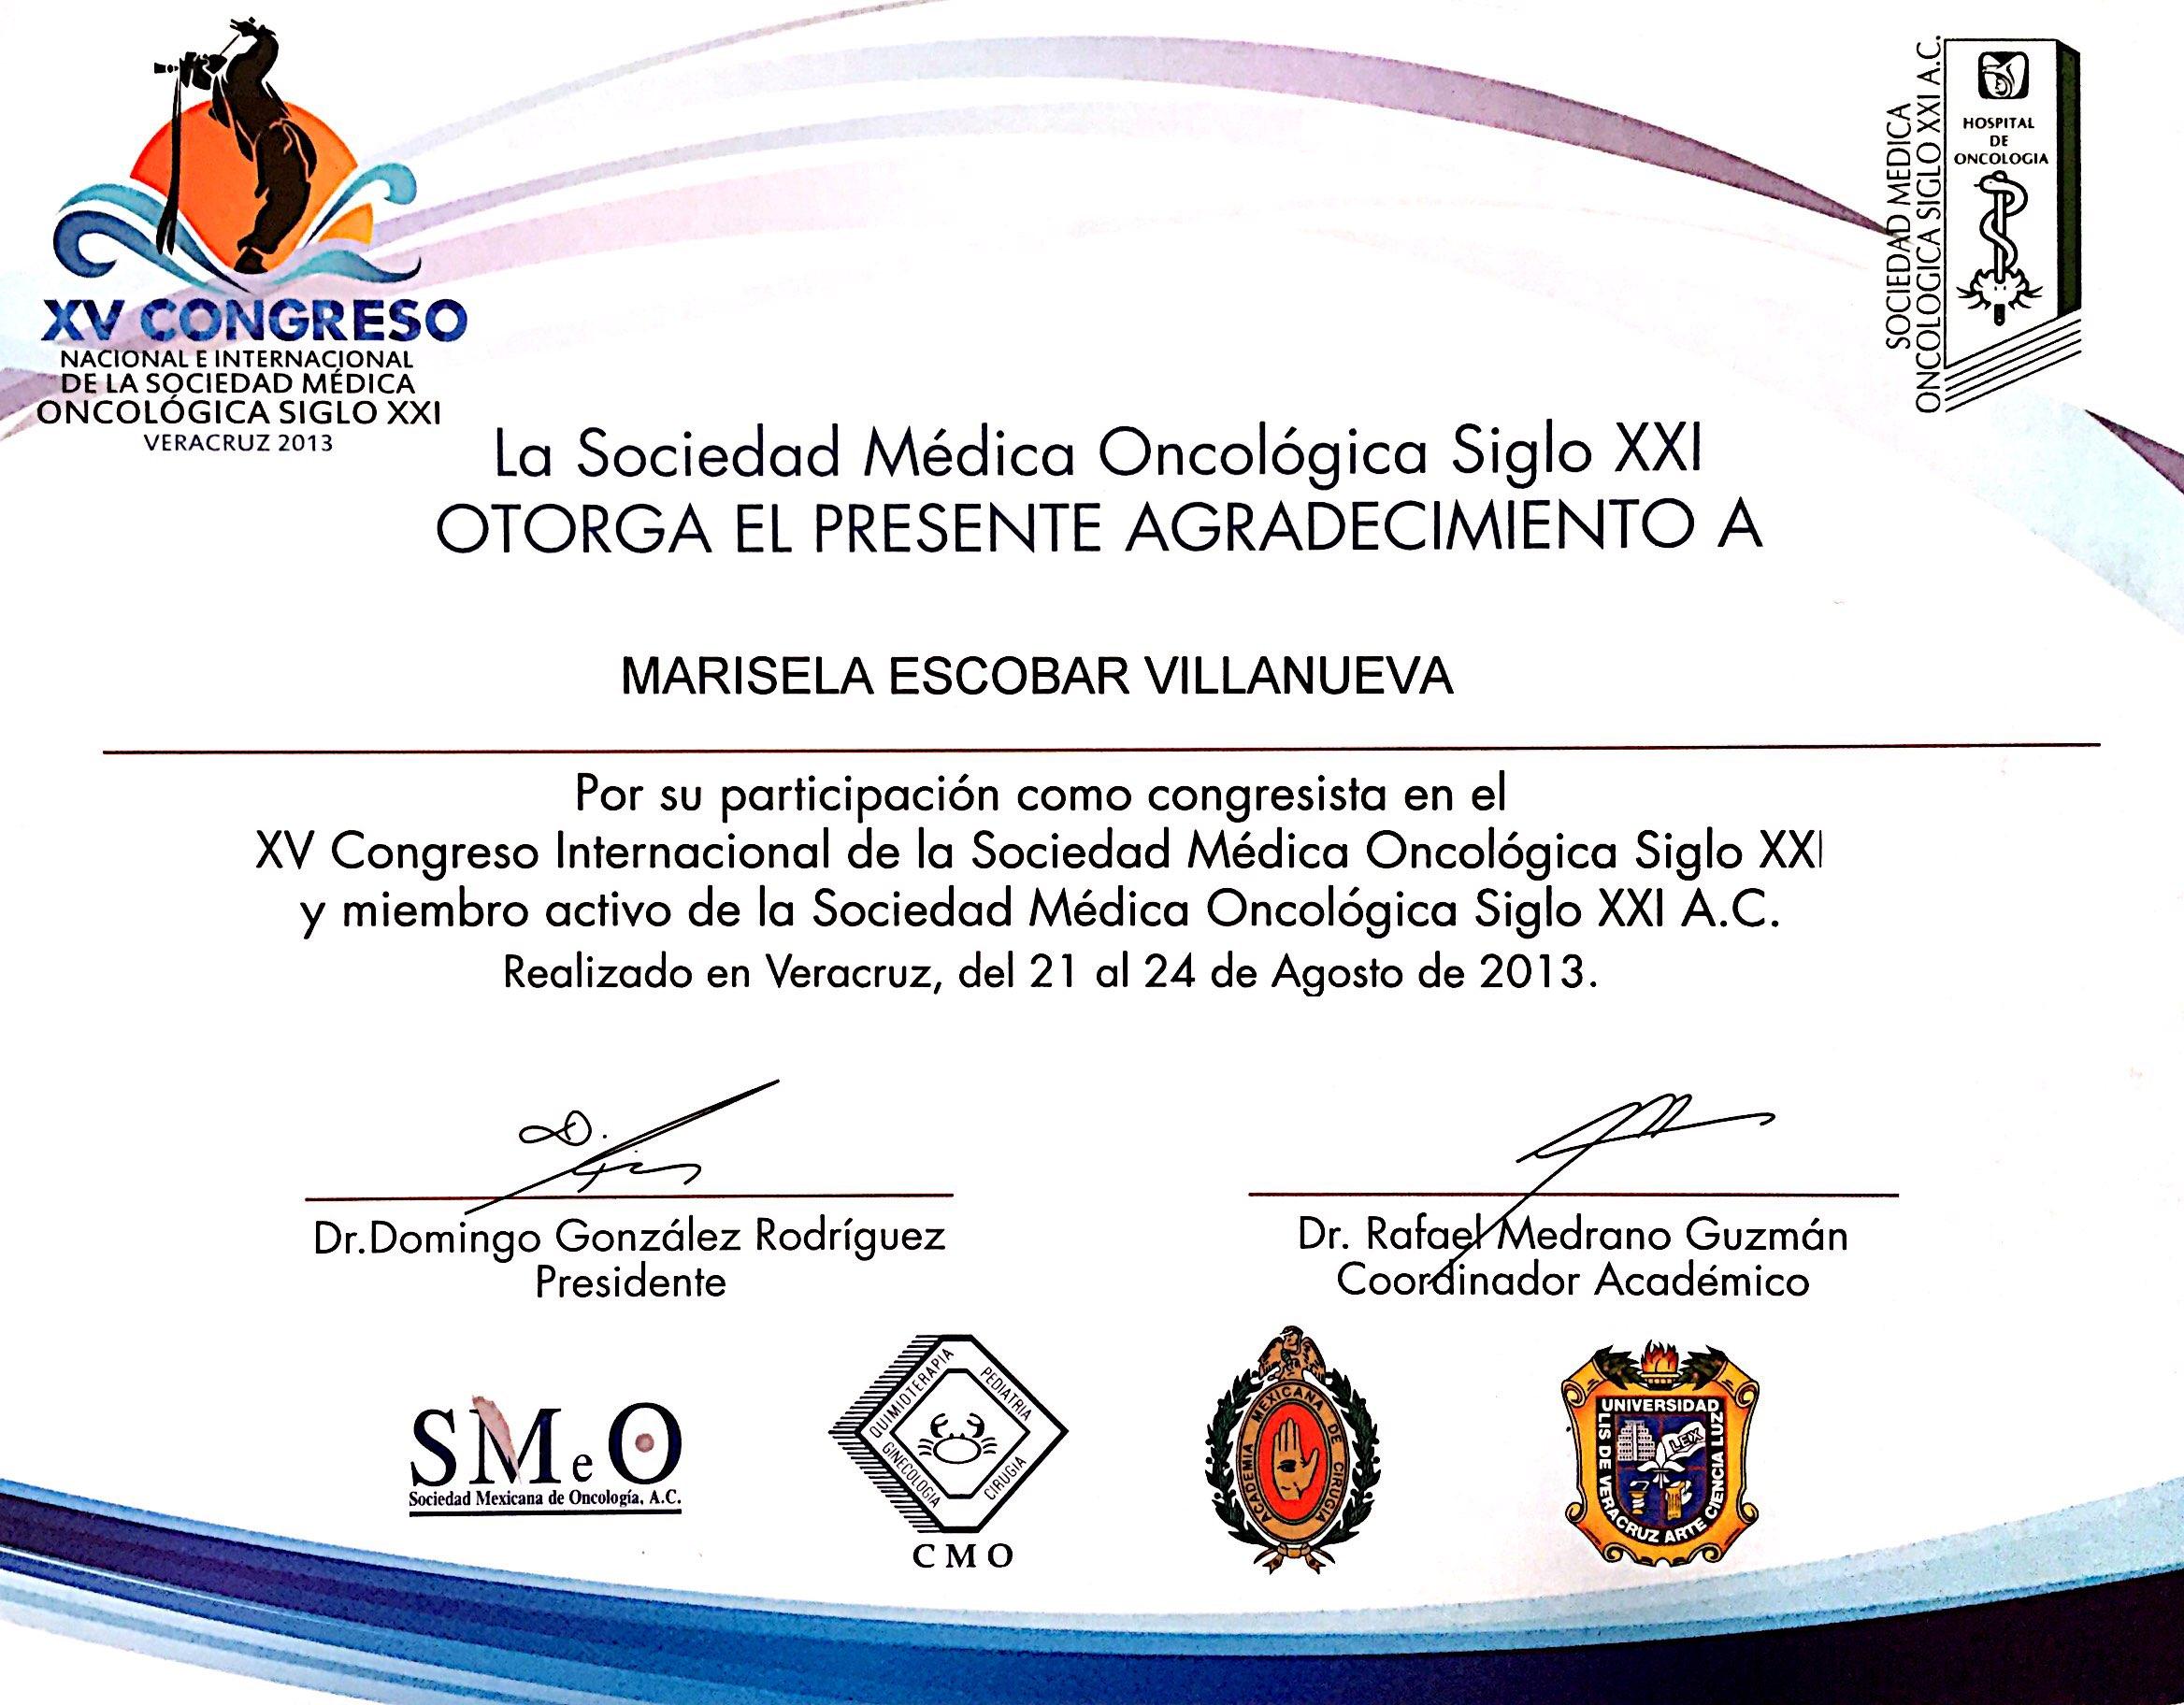 Nuevo doc 2018-02-20 11.21.39_14